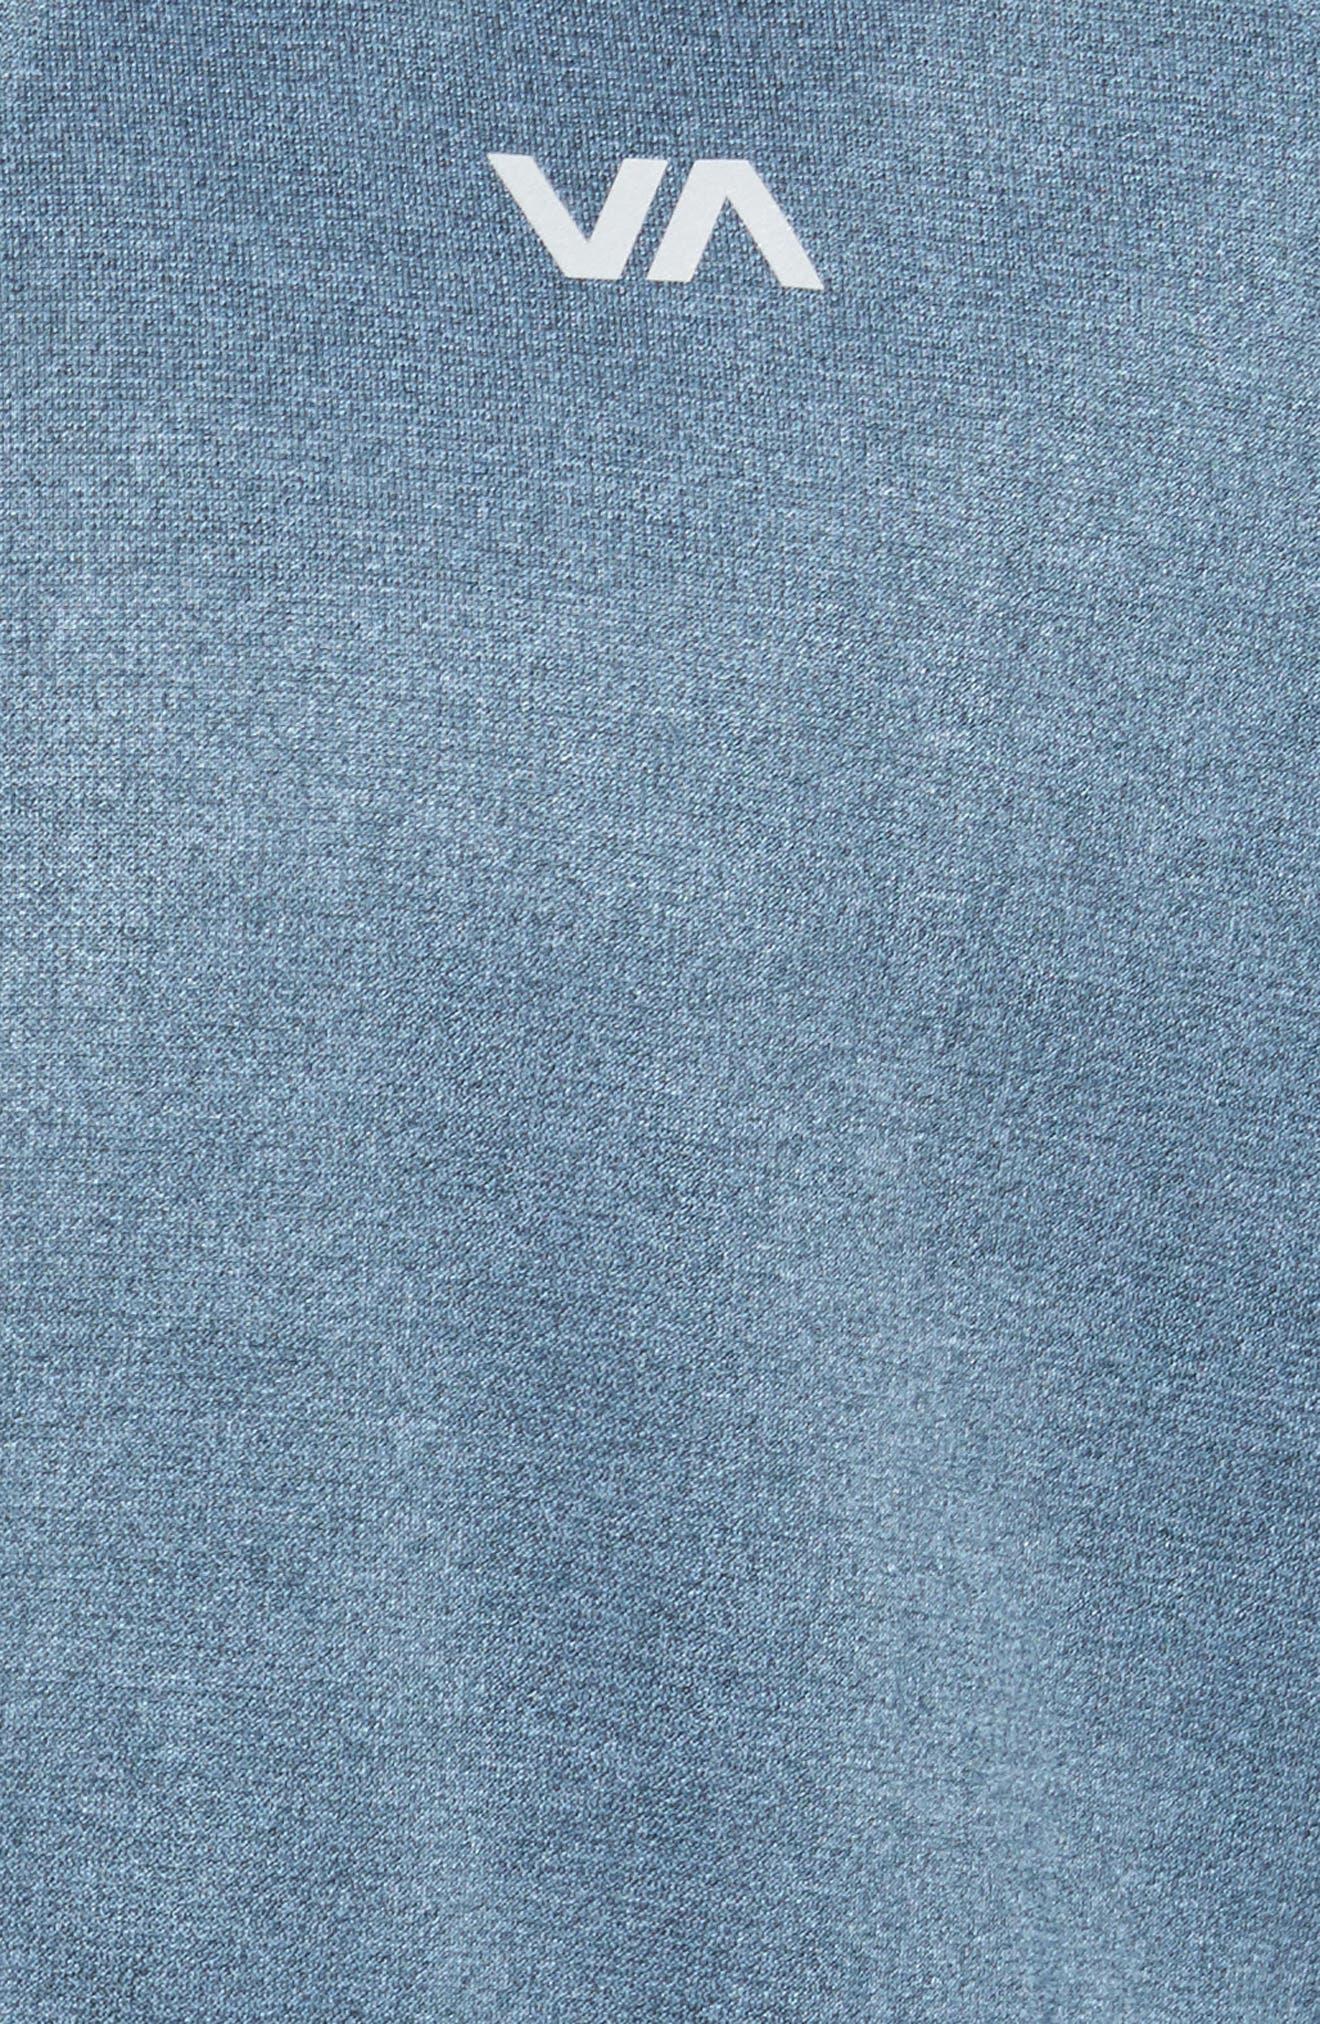 Shermin Zip Hoodie,                             Alternate thumbnail 5, color,                             Desert Blue